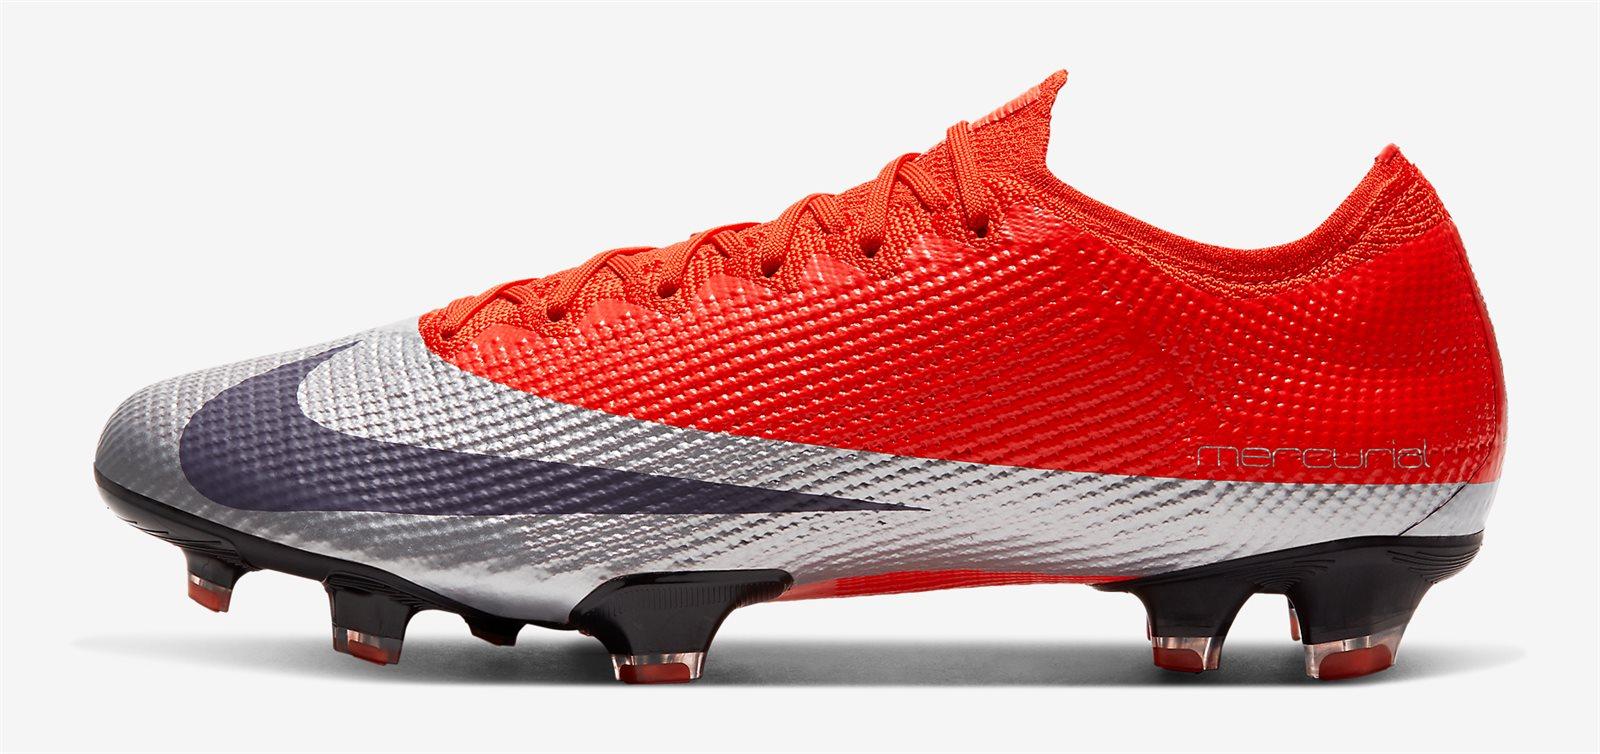 Giay da bong Nike Mercurial Vapor 13 Elite dep nhat (2)